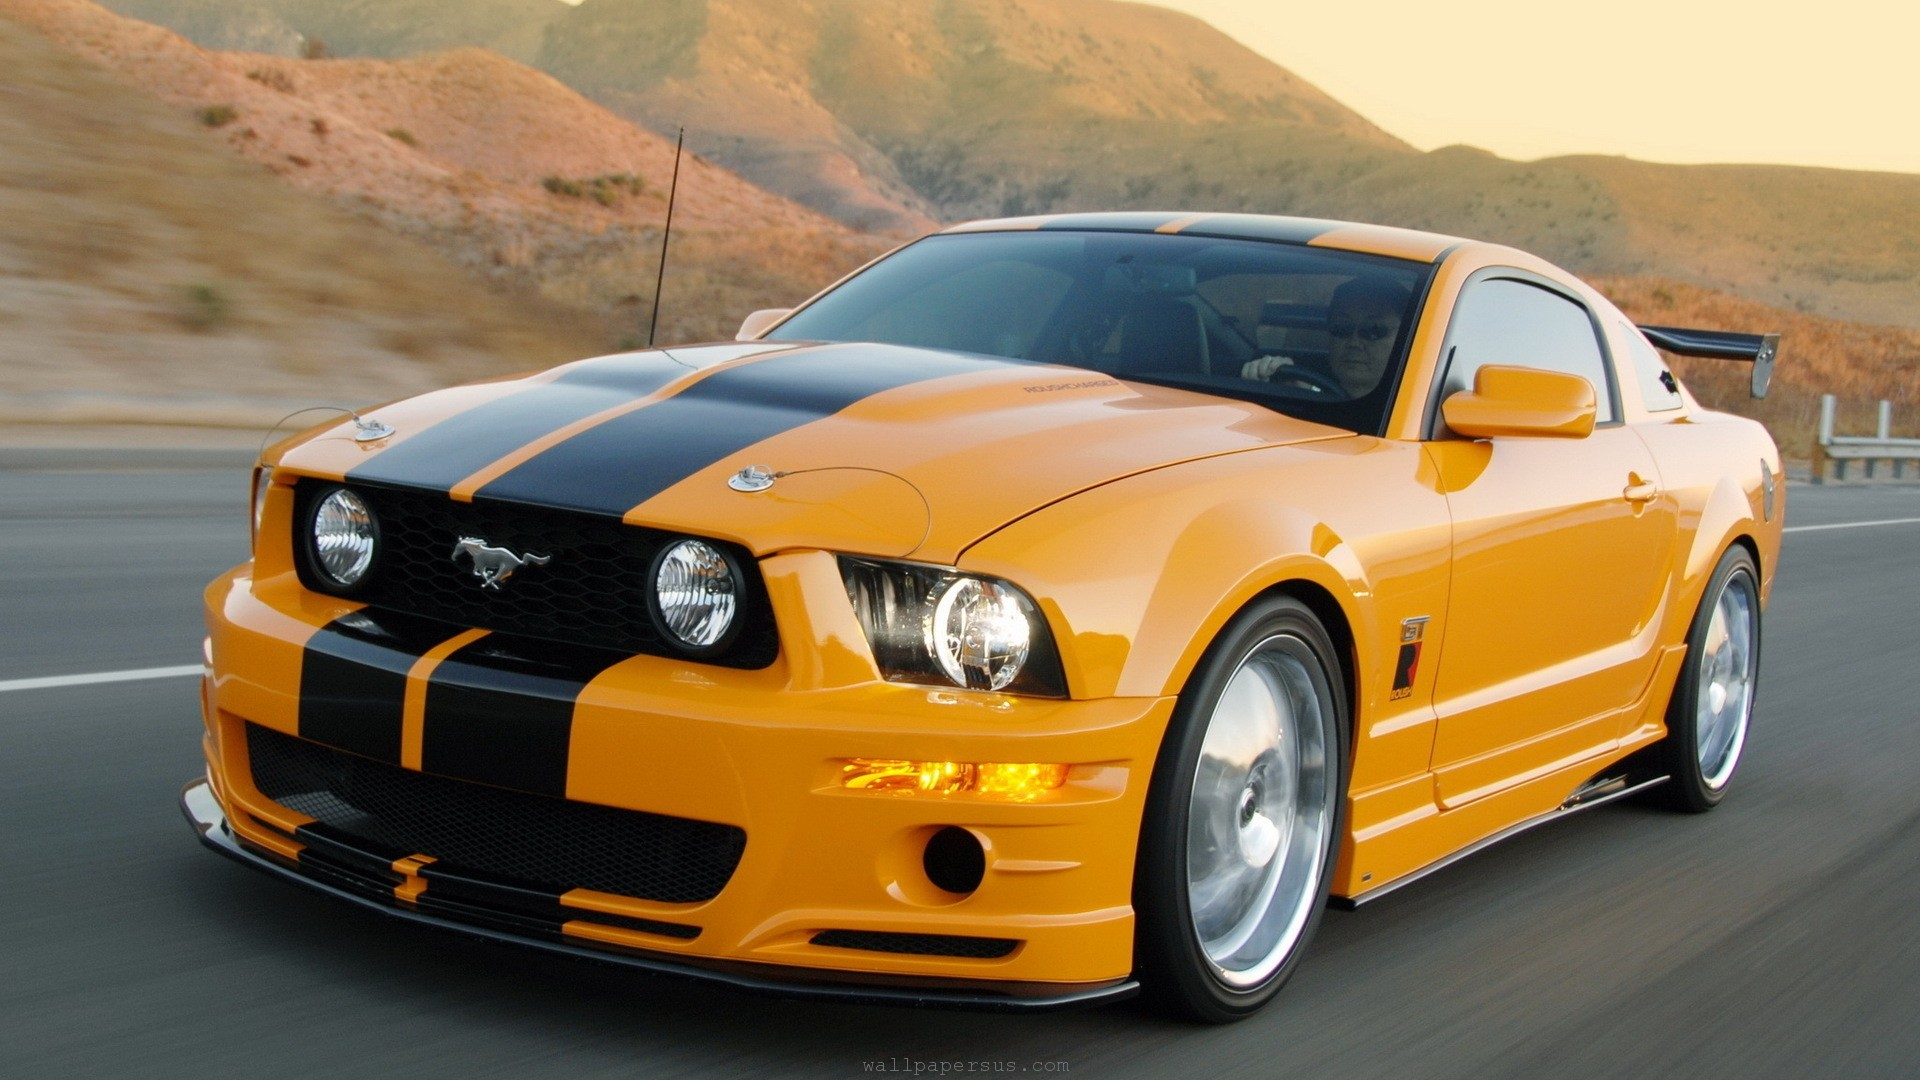 Ford Mustang Tuning Car Photo